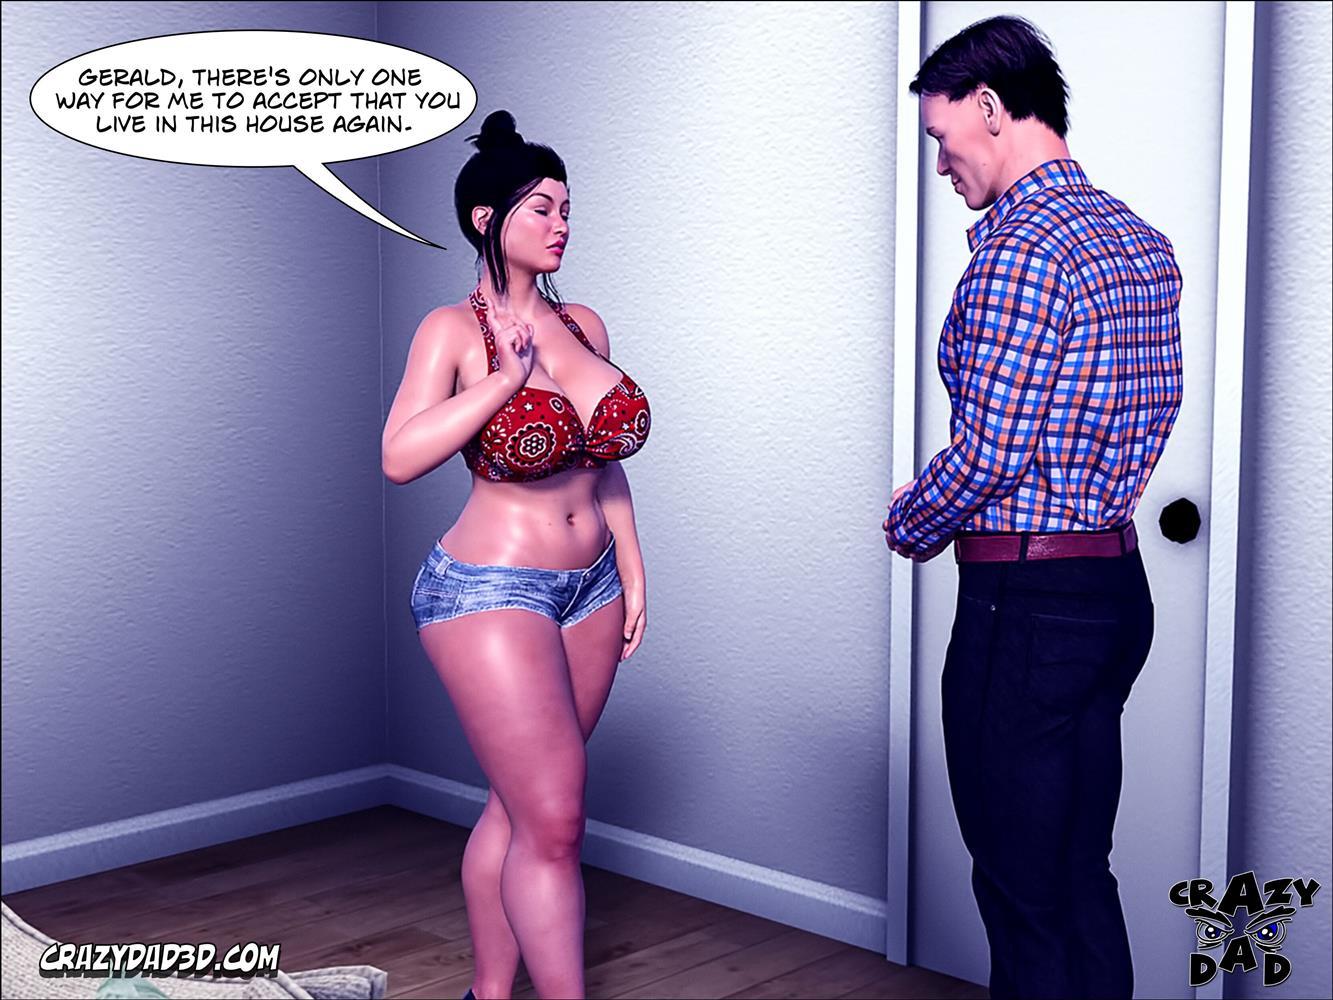 Mom's Help 18 [Crazy Dad 3D] - Foto 58